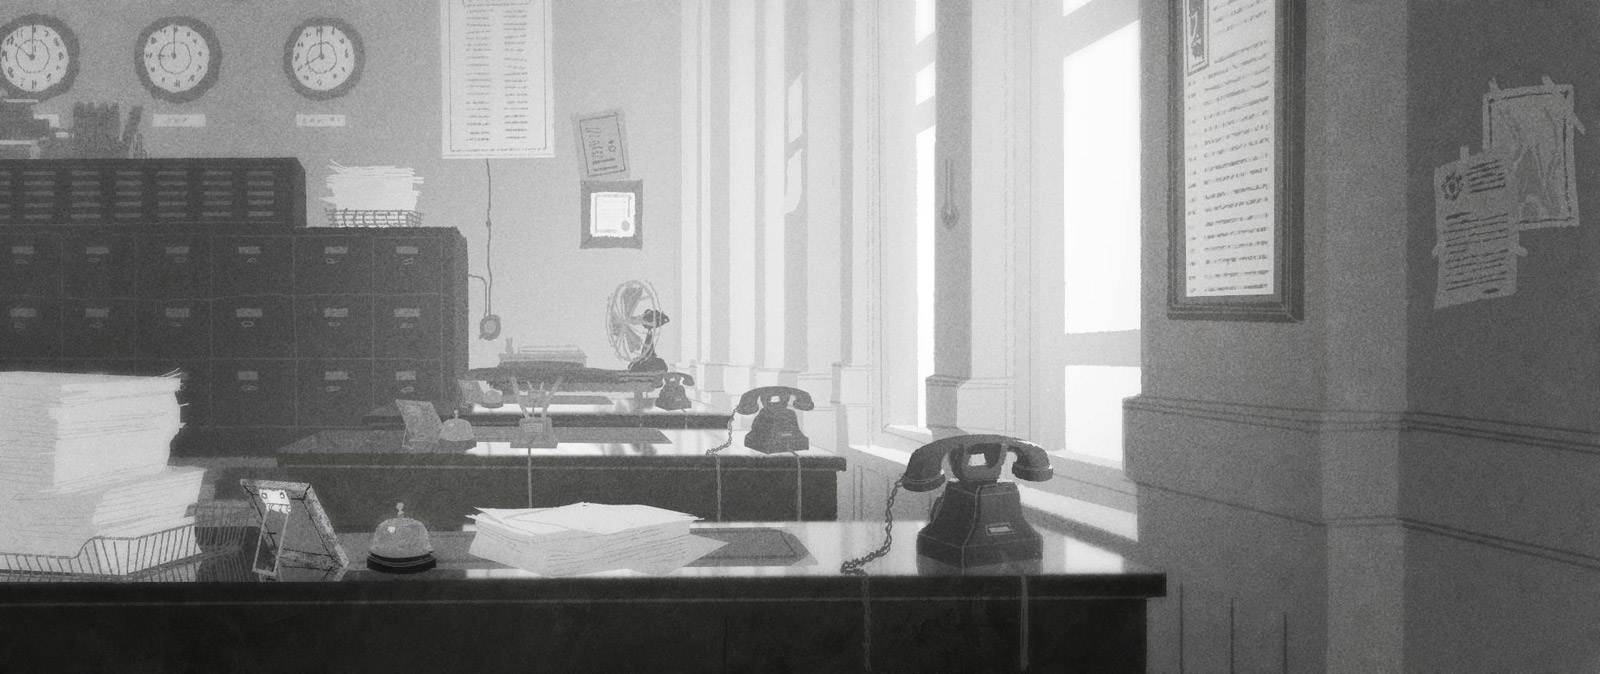 paperman-background-10.jpg